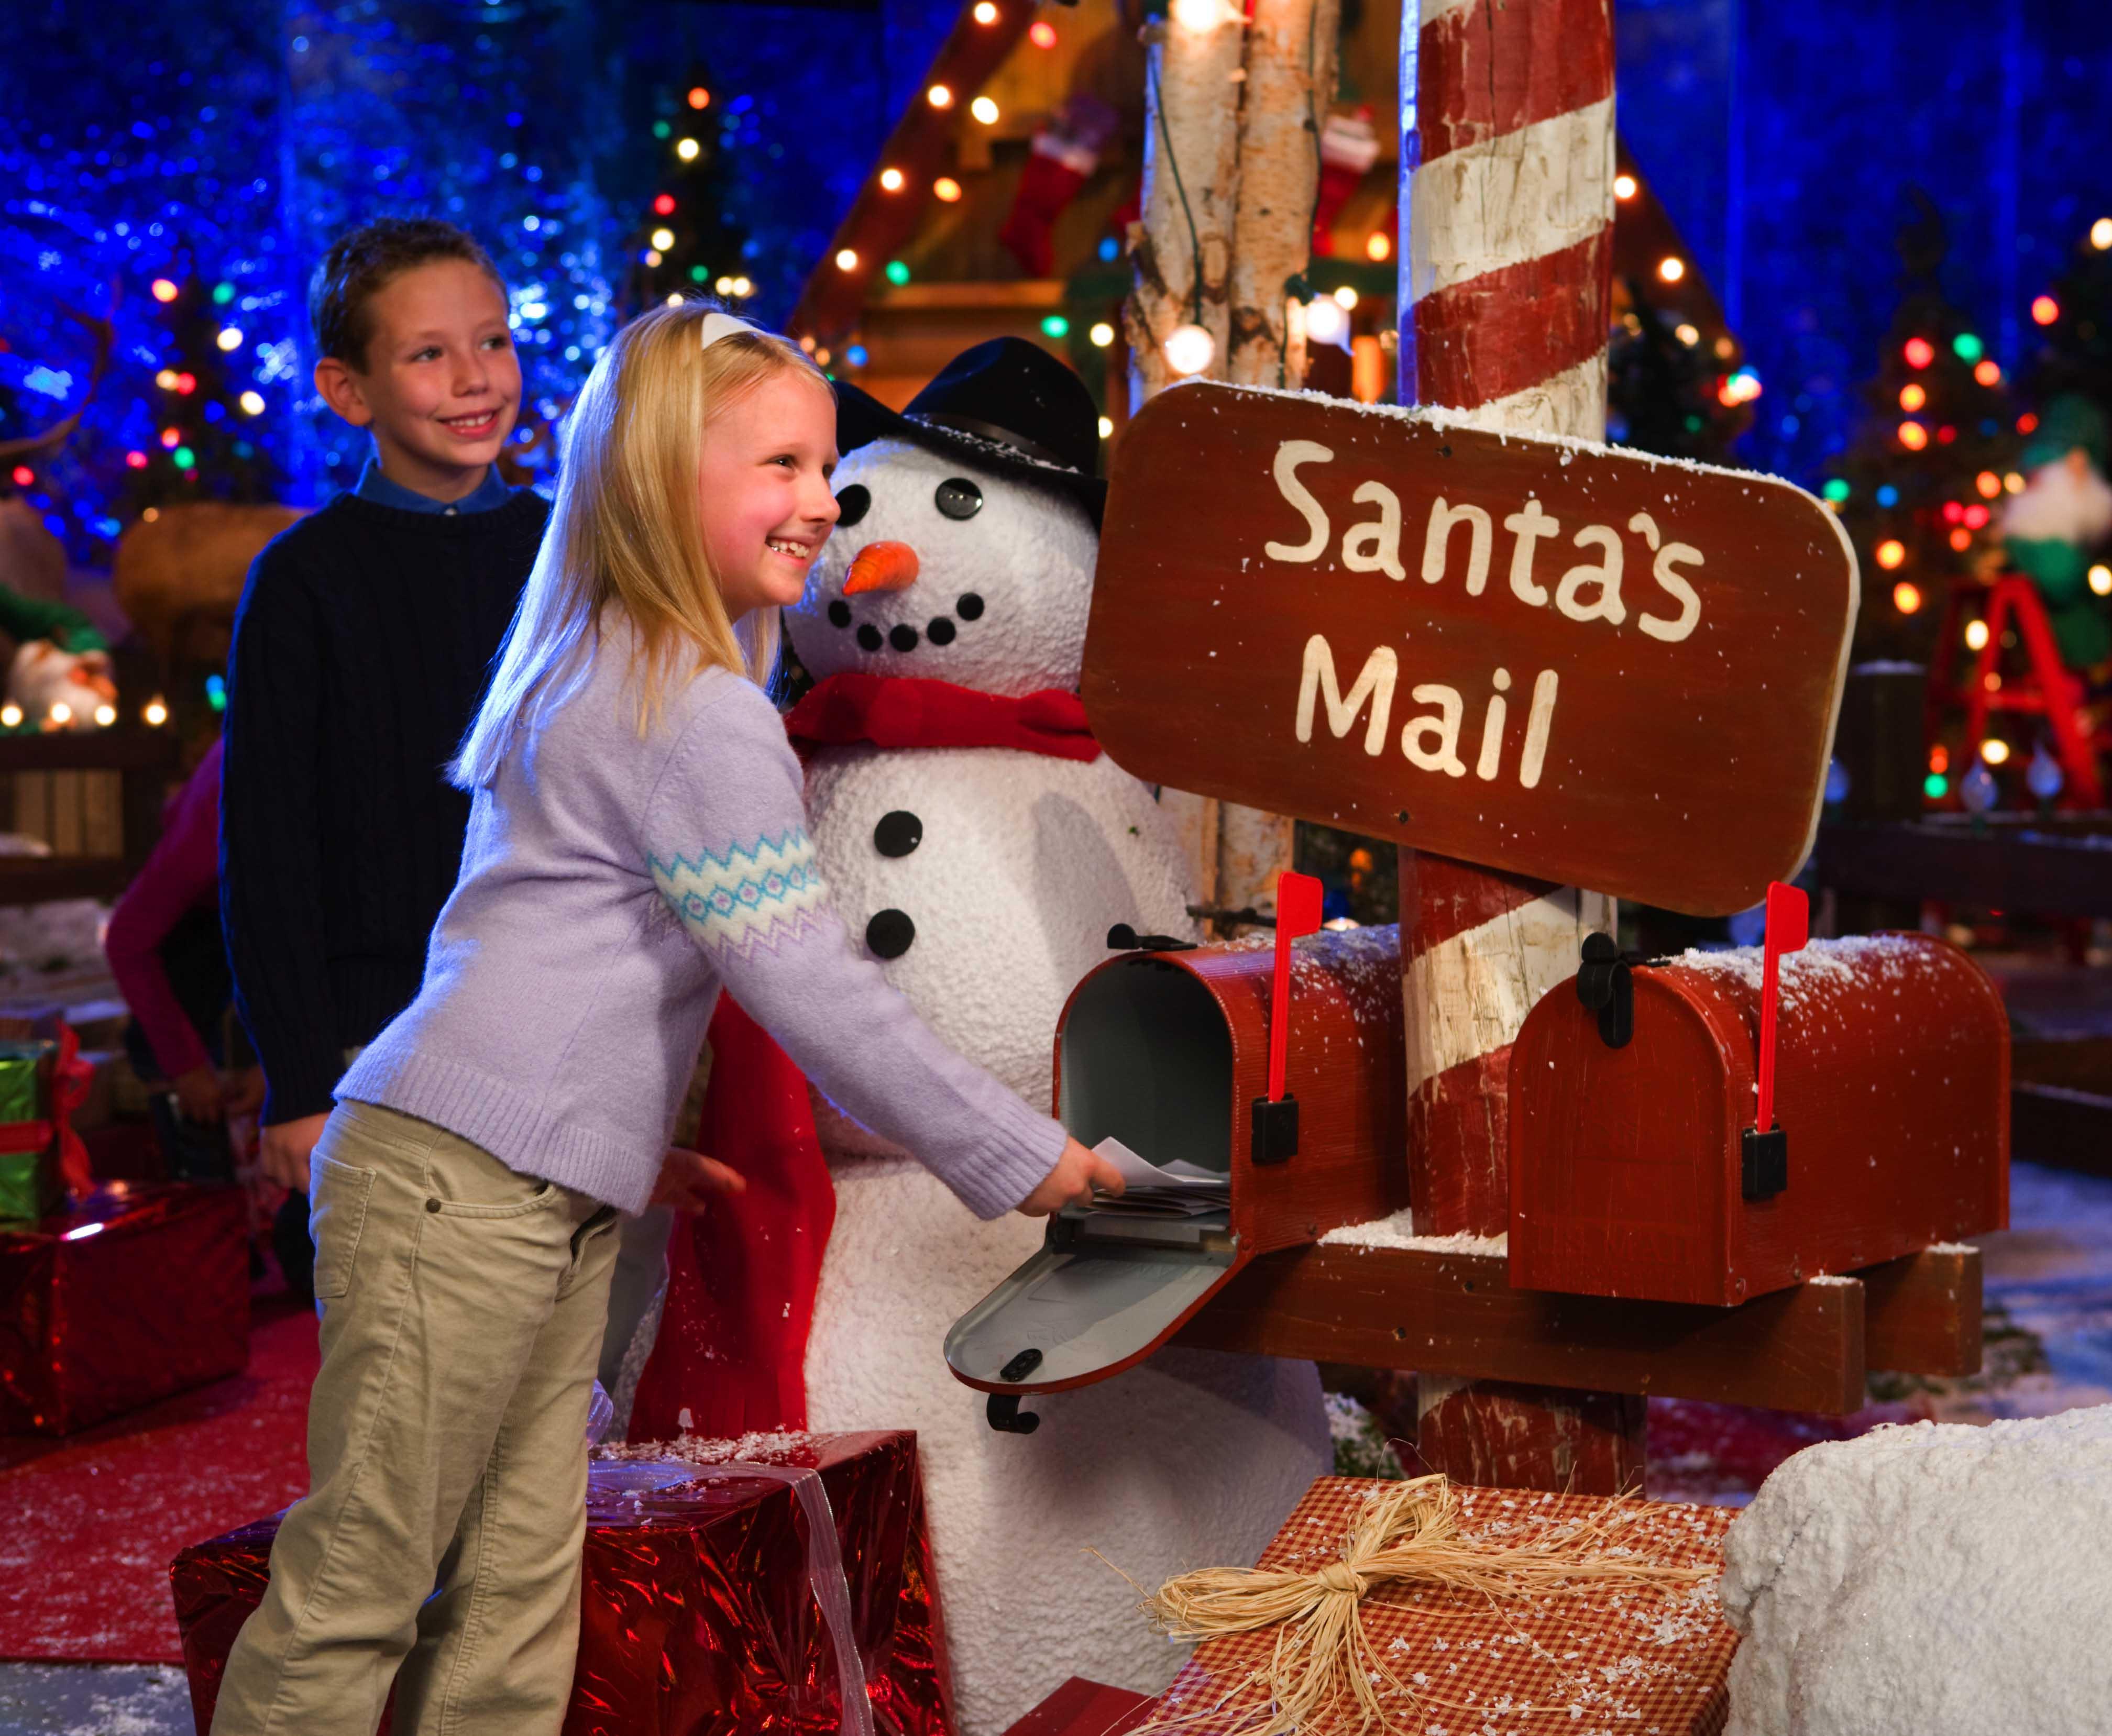 Mail On Christmas Eve 2019.Free Santa S Wonderland At Bass Pro Shop Cabela S